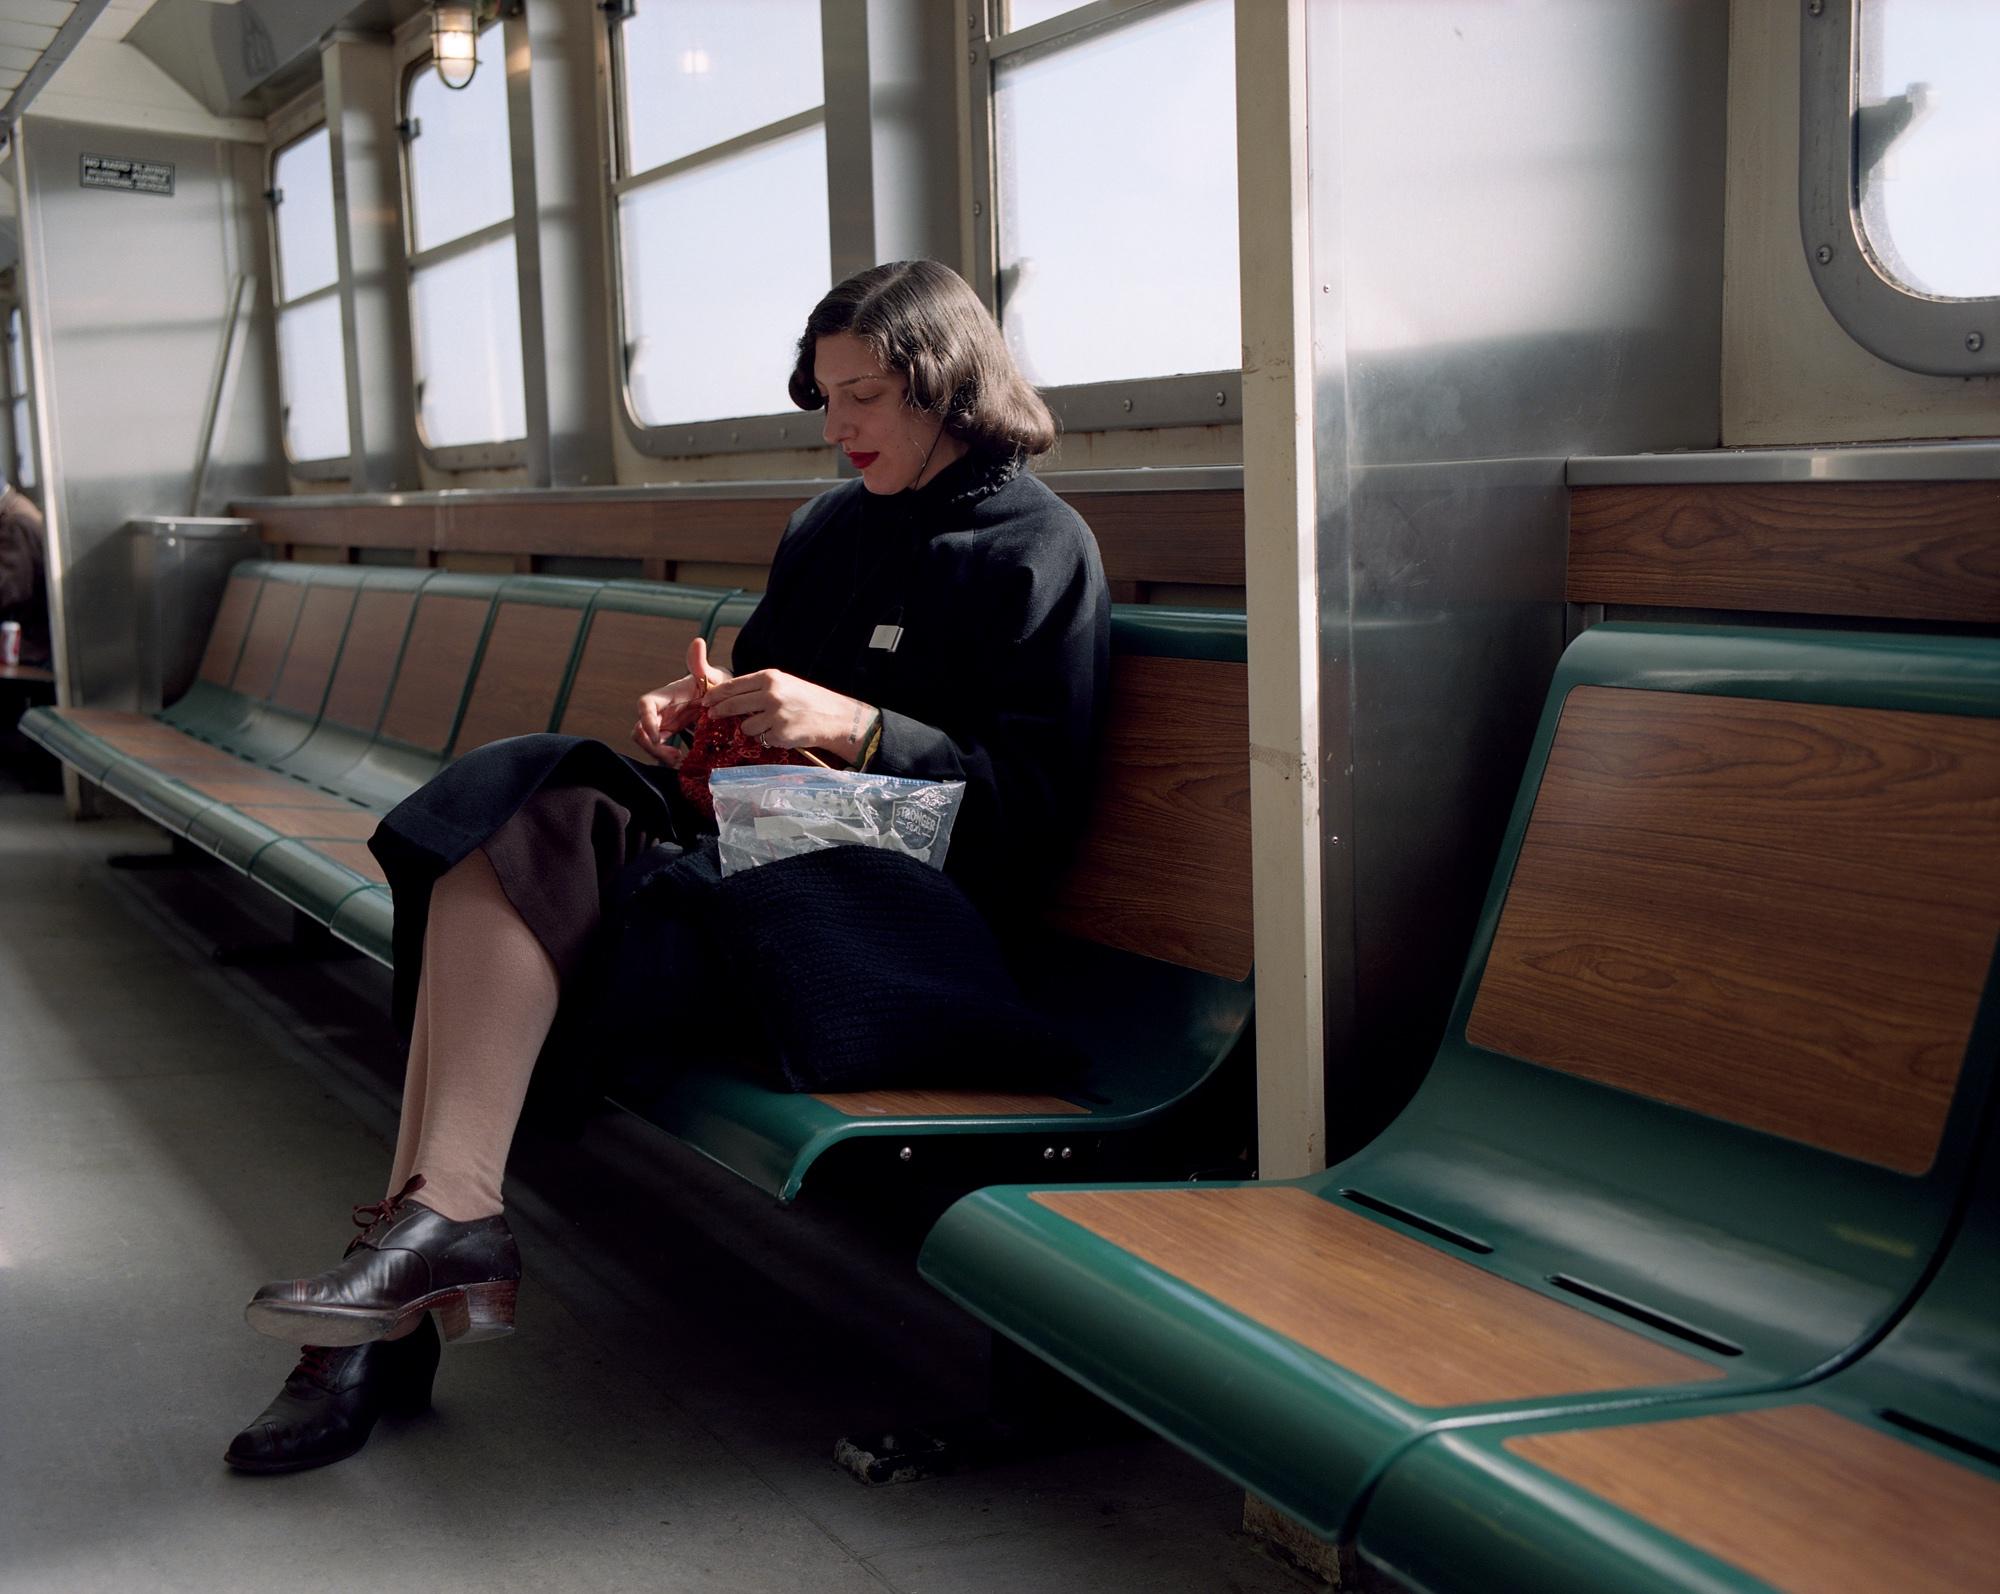 Lori, The Staten Island Ferry